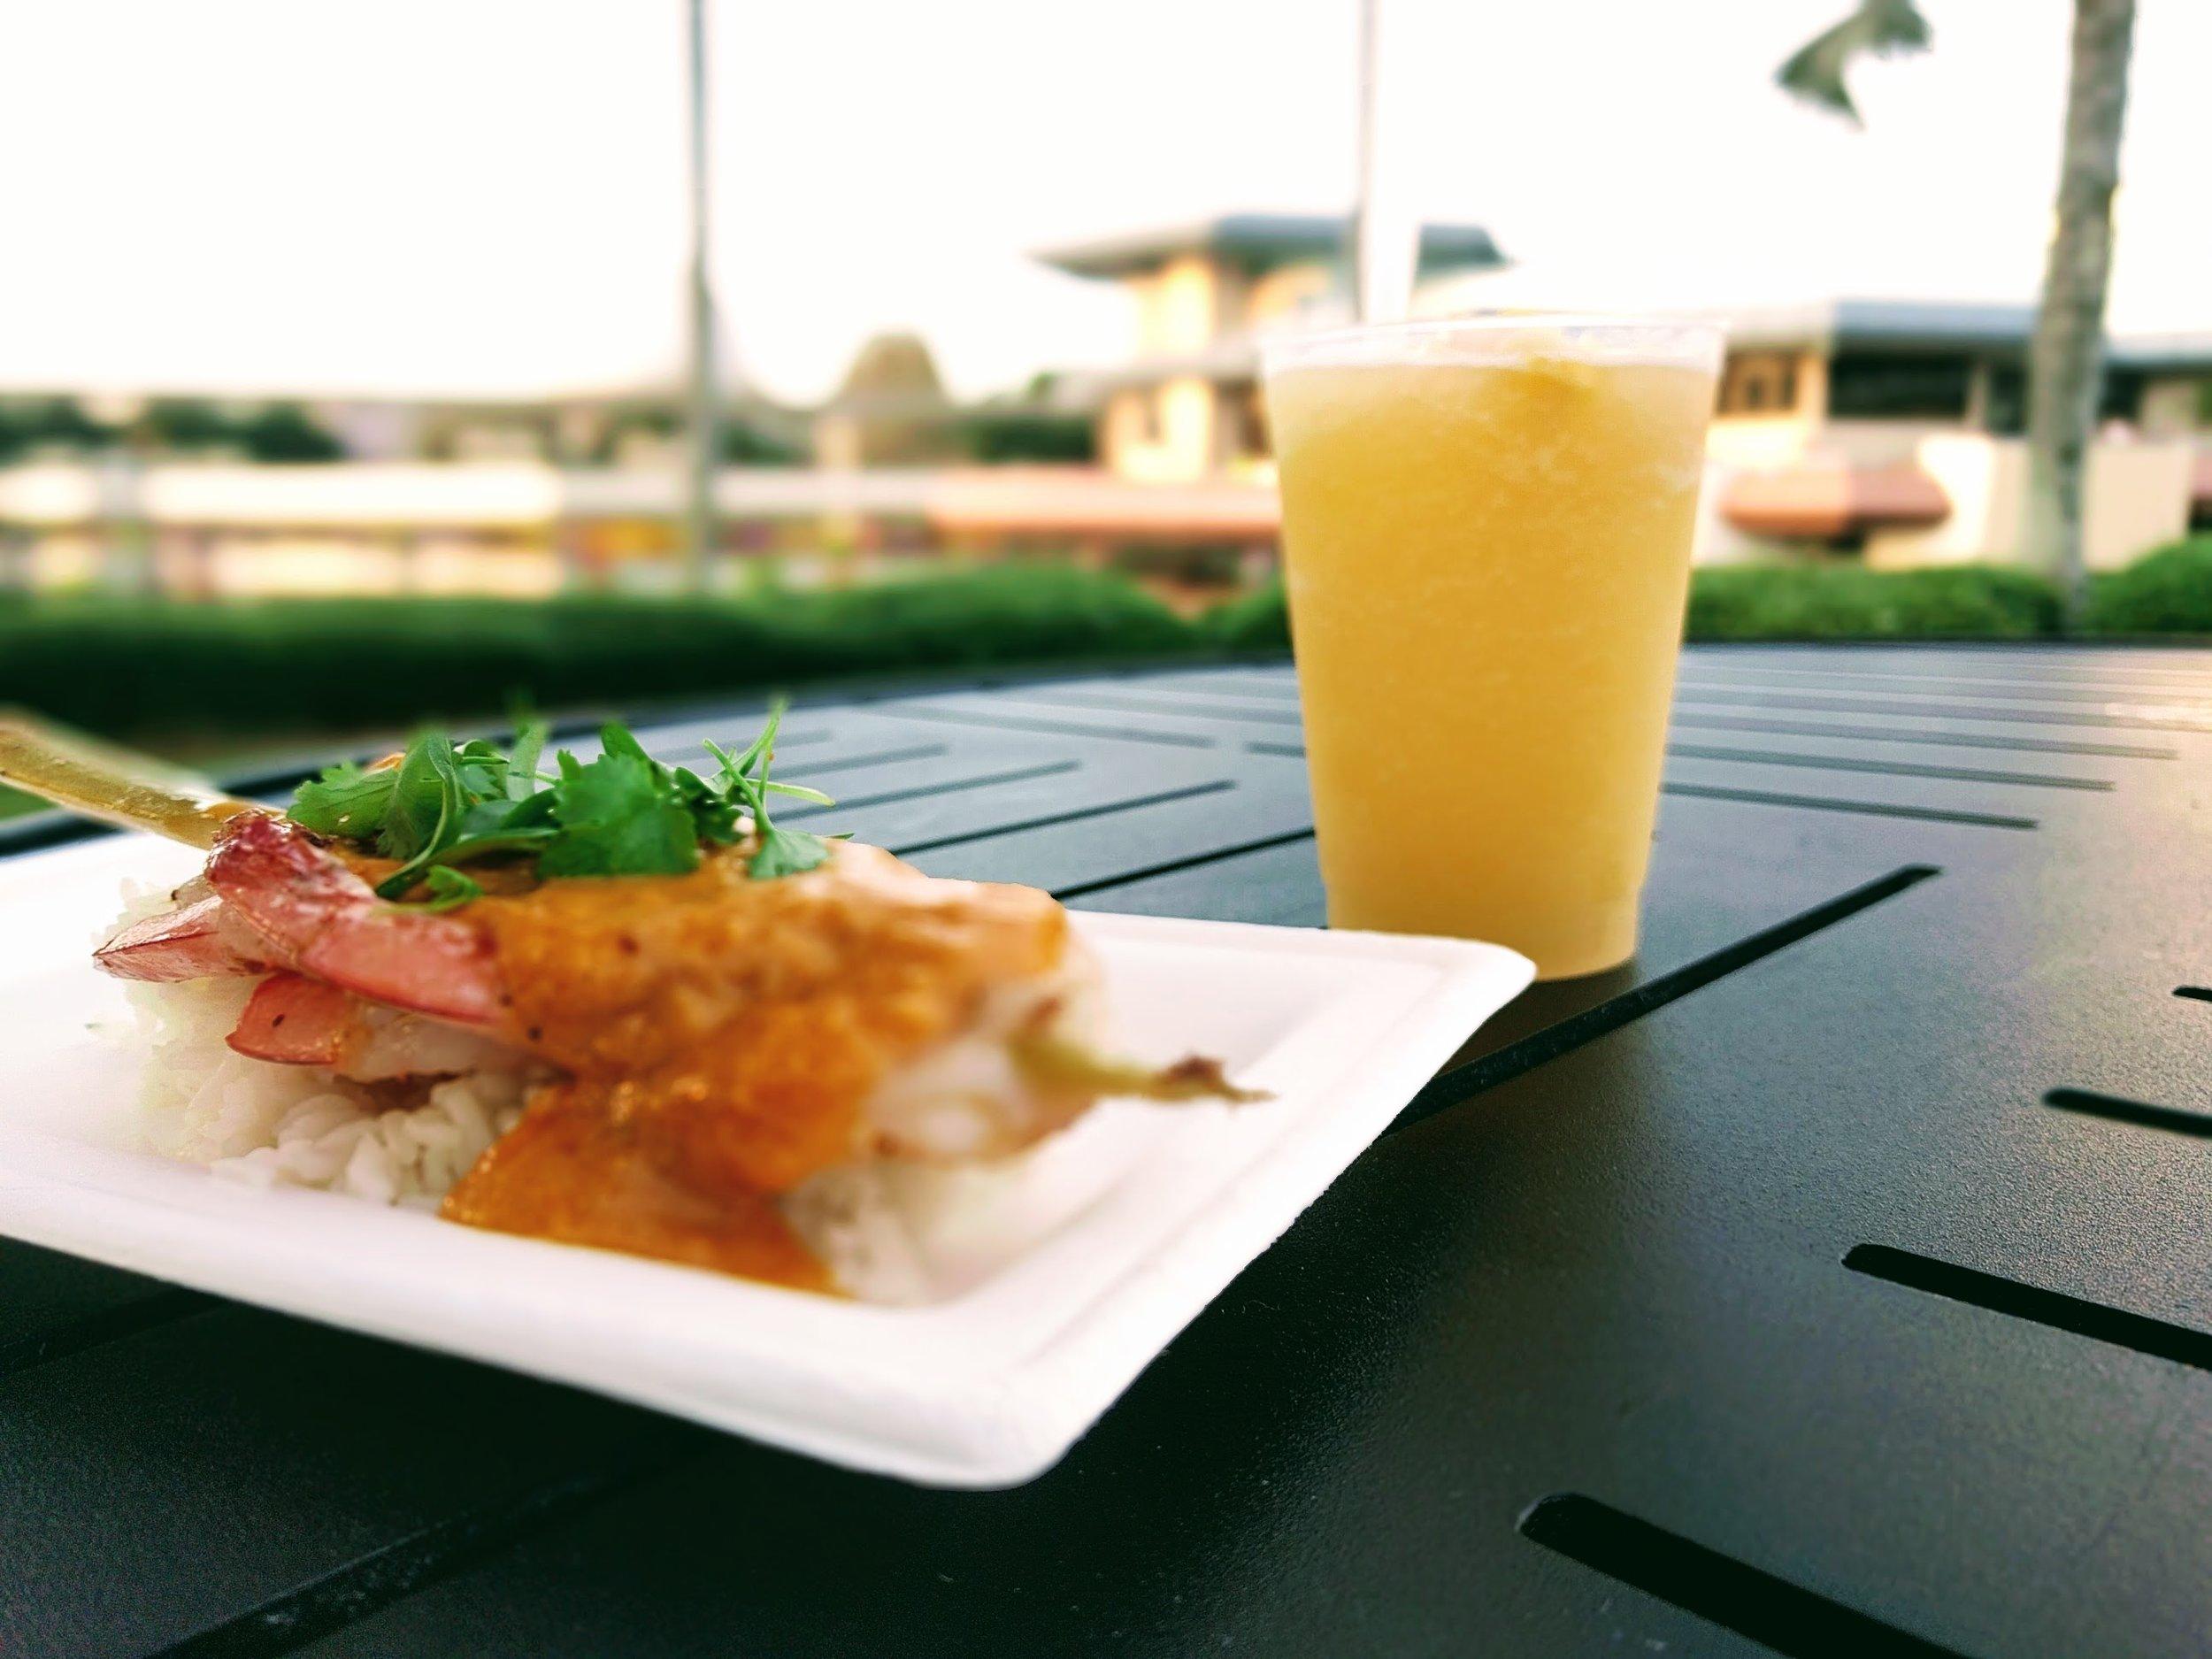 Sugar Cane Shrimp Skewer and Frozen Simple Tropical Juice Drink (non-alcholic)